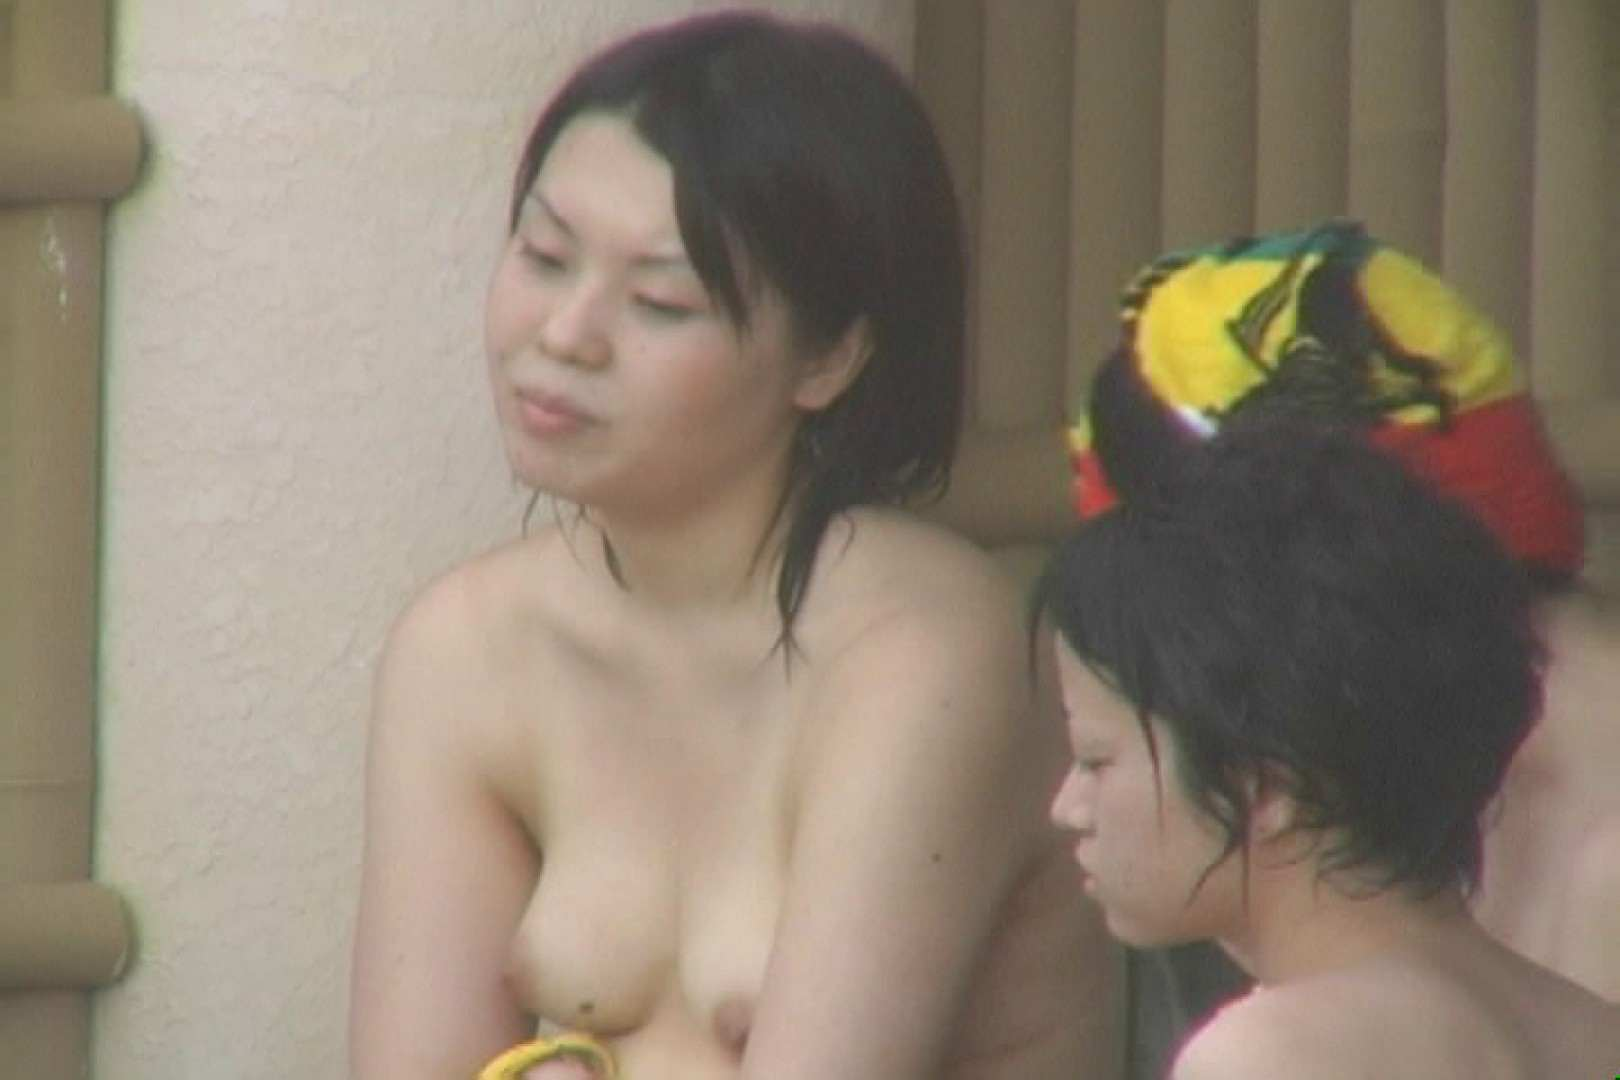 Aquaな露天風呂Vol.61【VIP限定】 いやらしいOL エロ無料画像 89連発 18